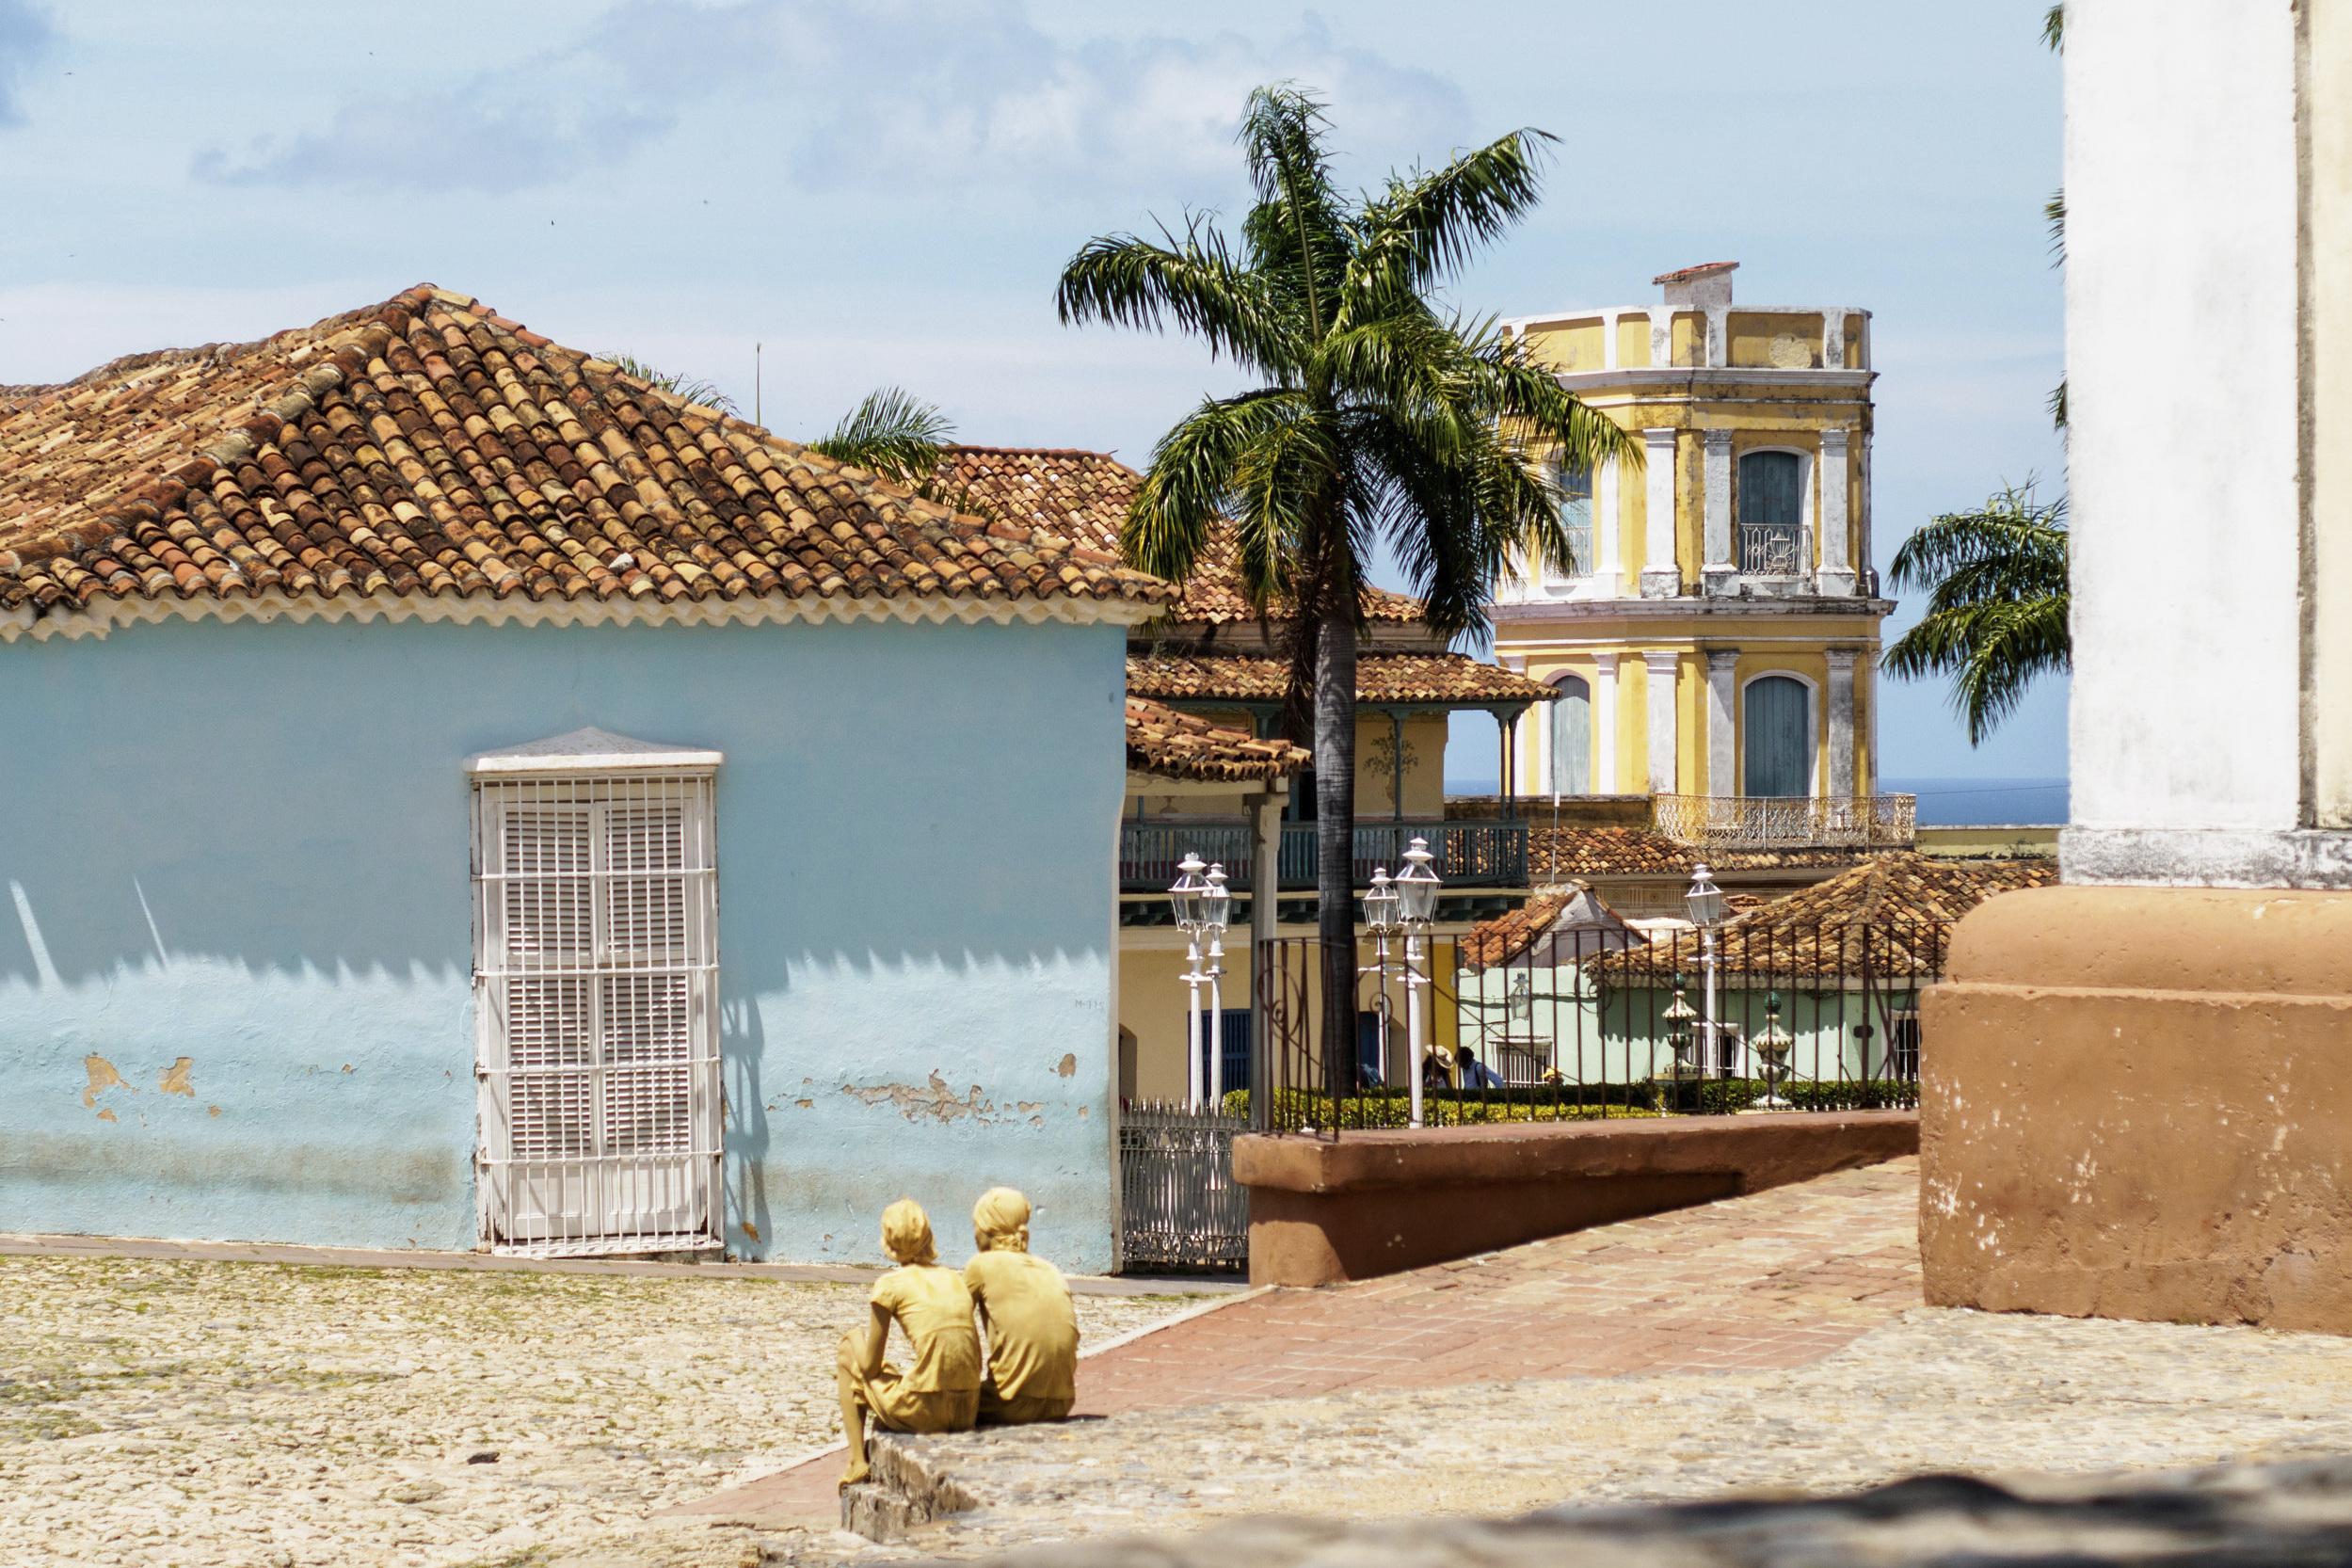 Colonial Trinidad's iconic cobblestone streets